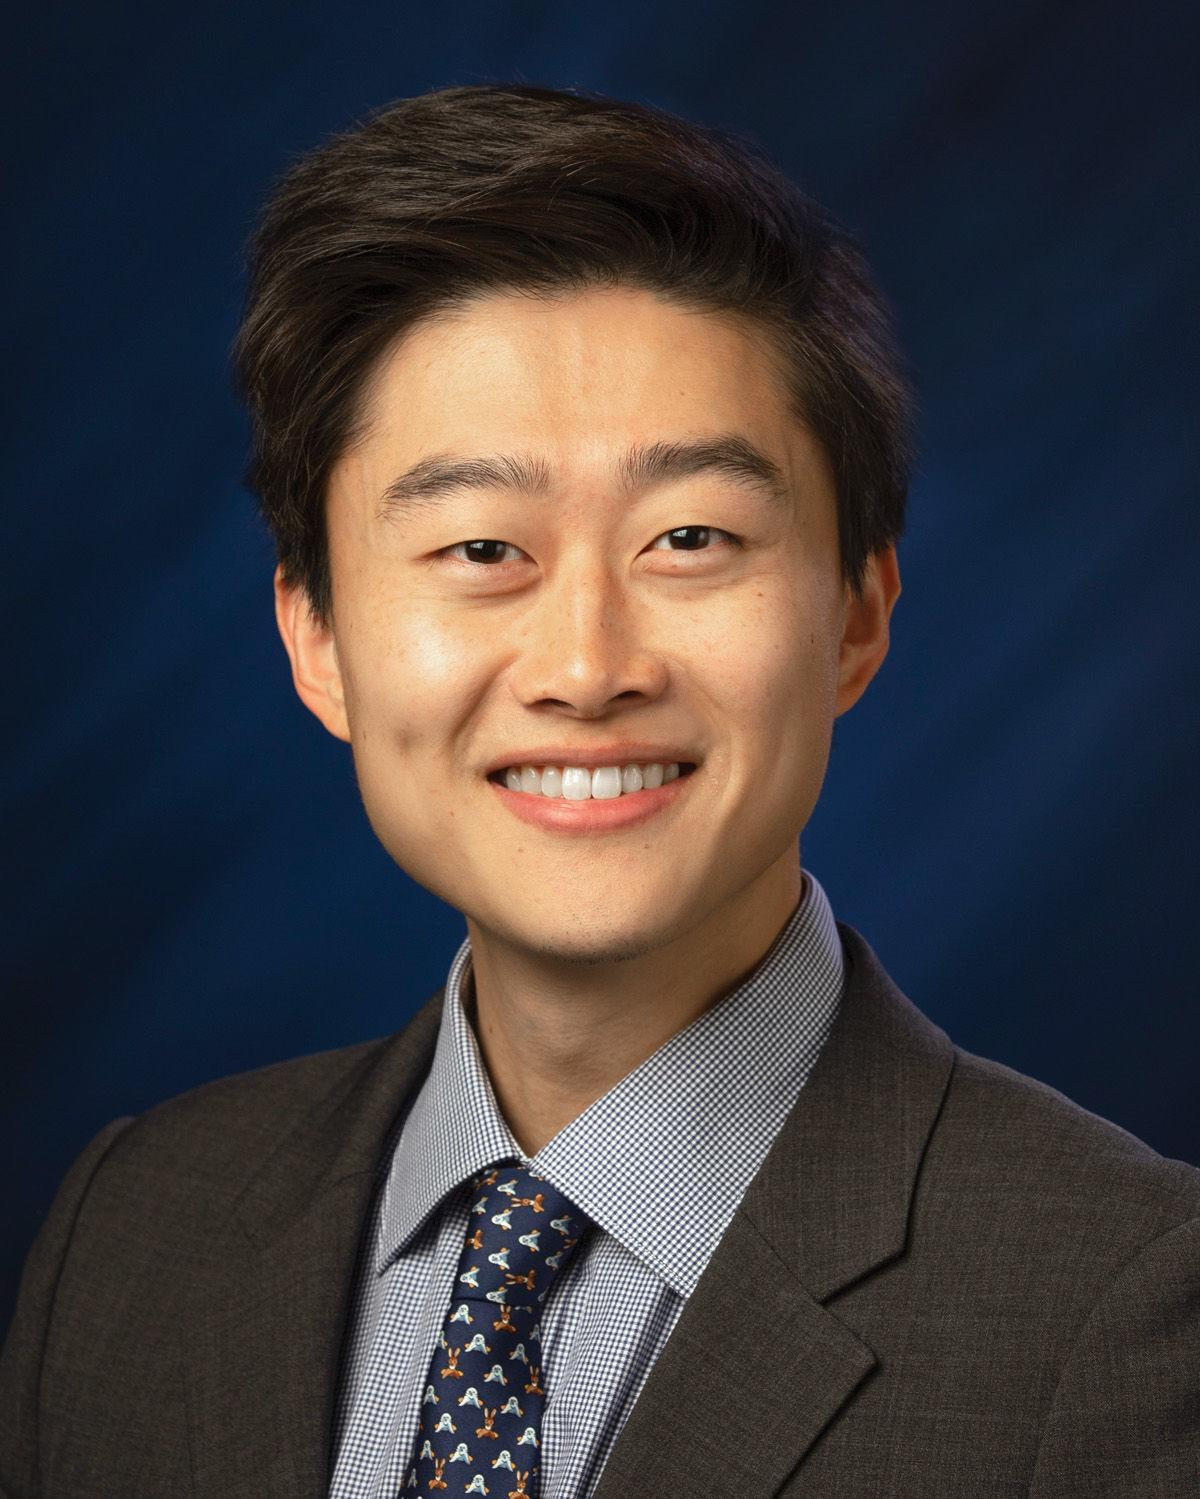 State Rep. Chris Chyung, D-Dyer